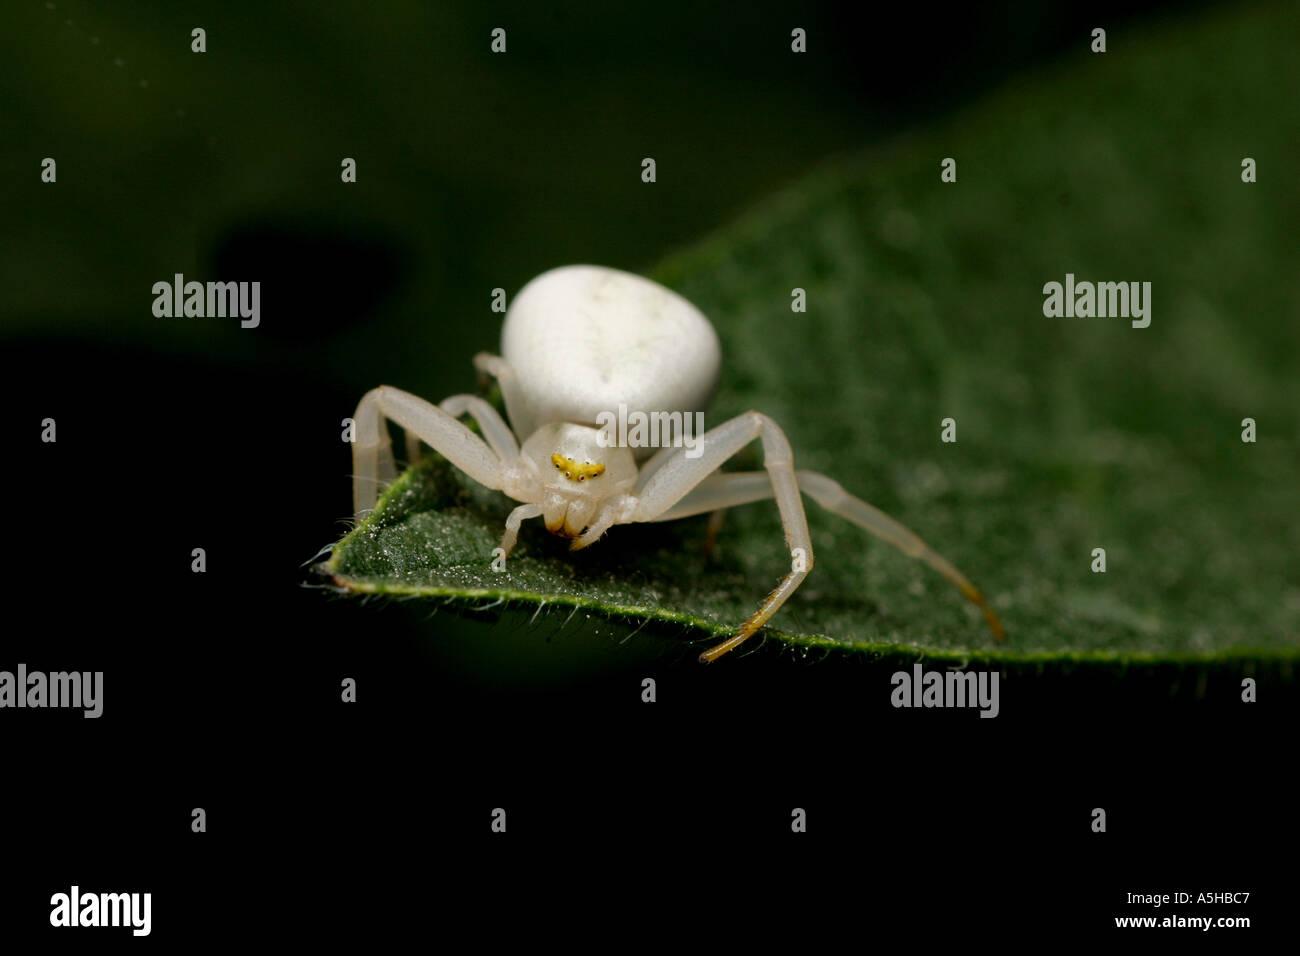 White Crab spider, Misumena vatia Stock Photo